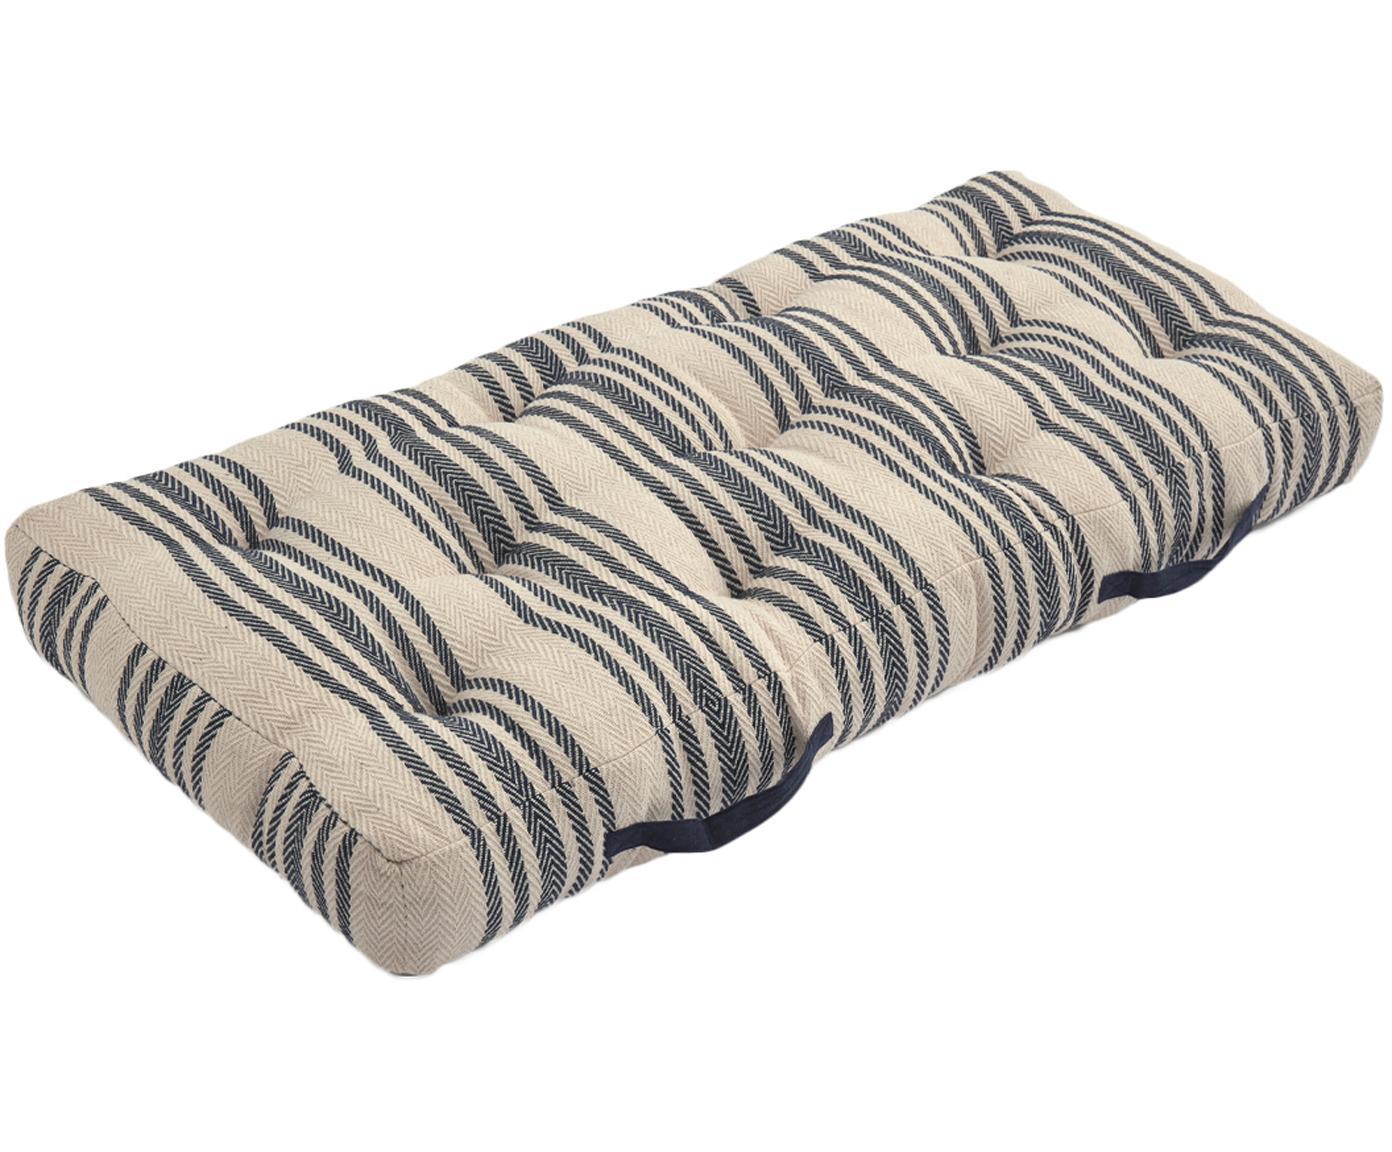 Cuscino da pavimento a righe Puket, Blu scuro, bianco, Larg. 60 x Lung. 120 cm